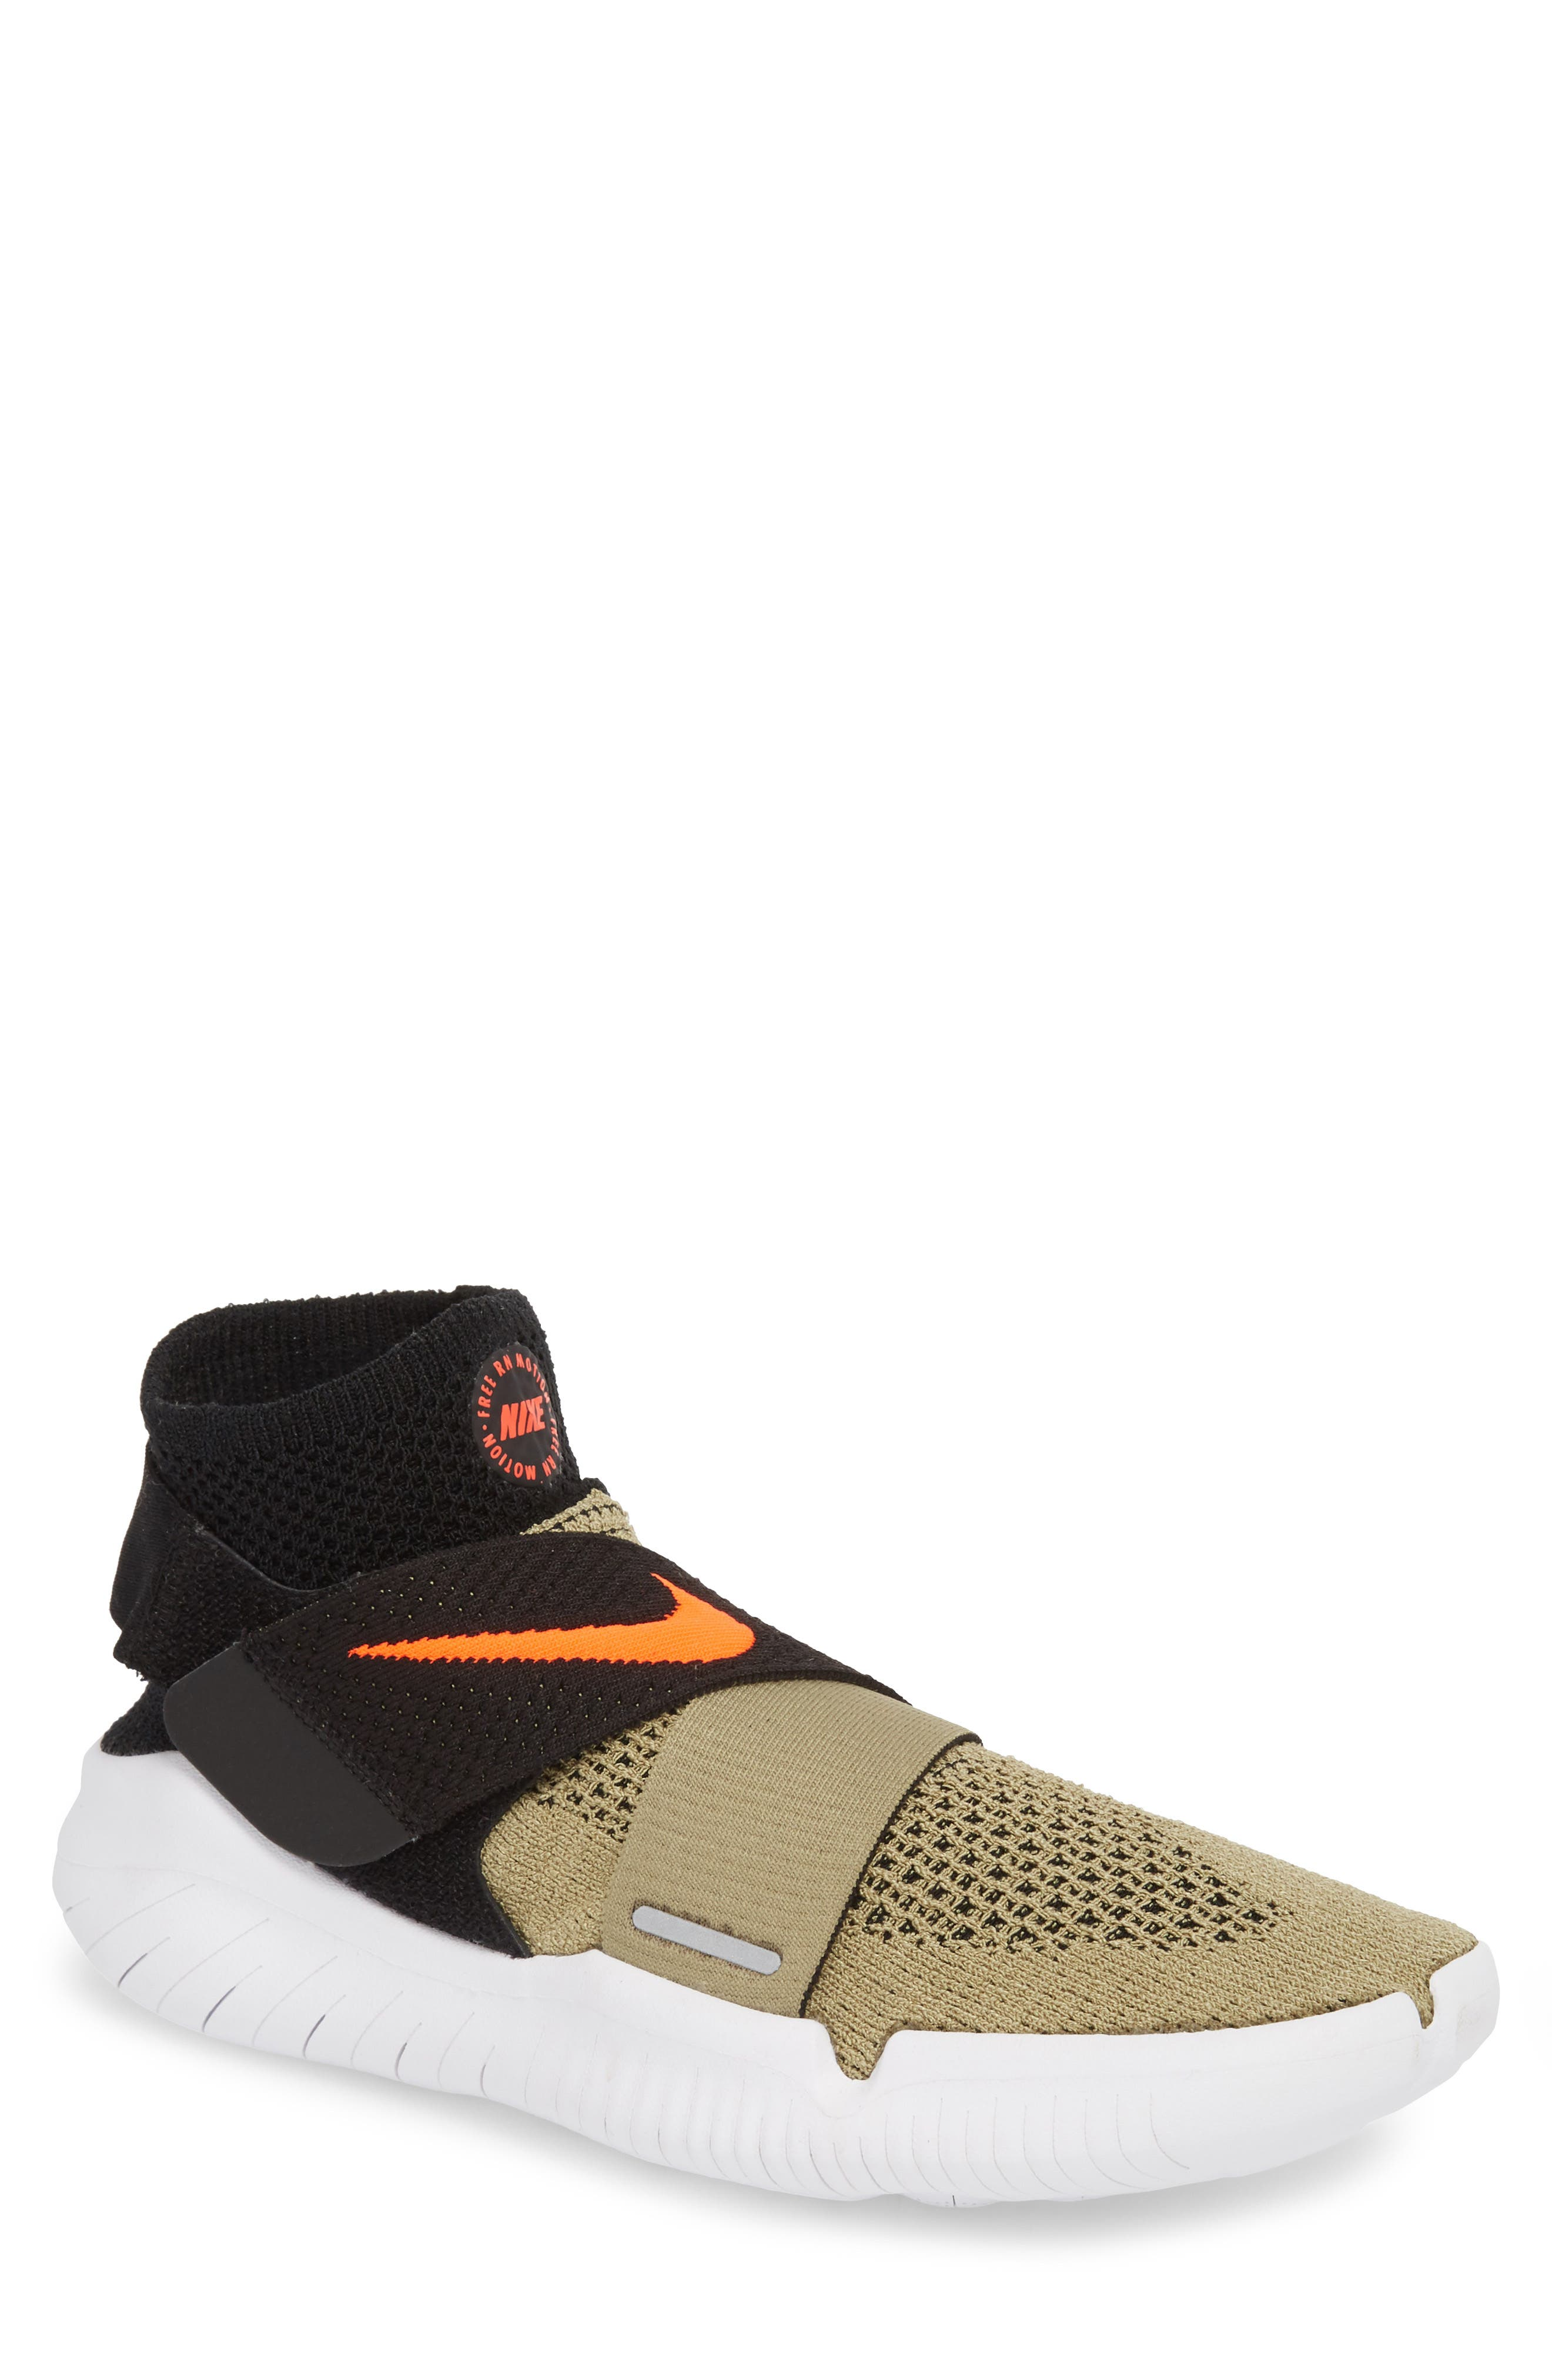 Nike Free RN Motion 2018 Flyknit Running Shoe (Men)